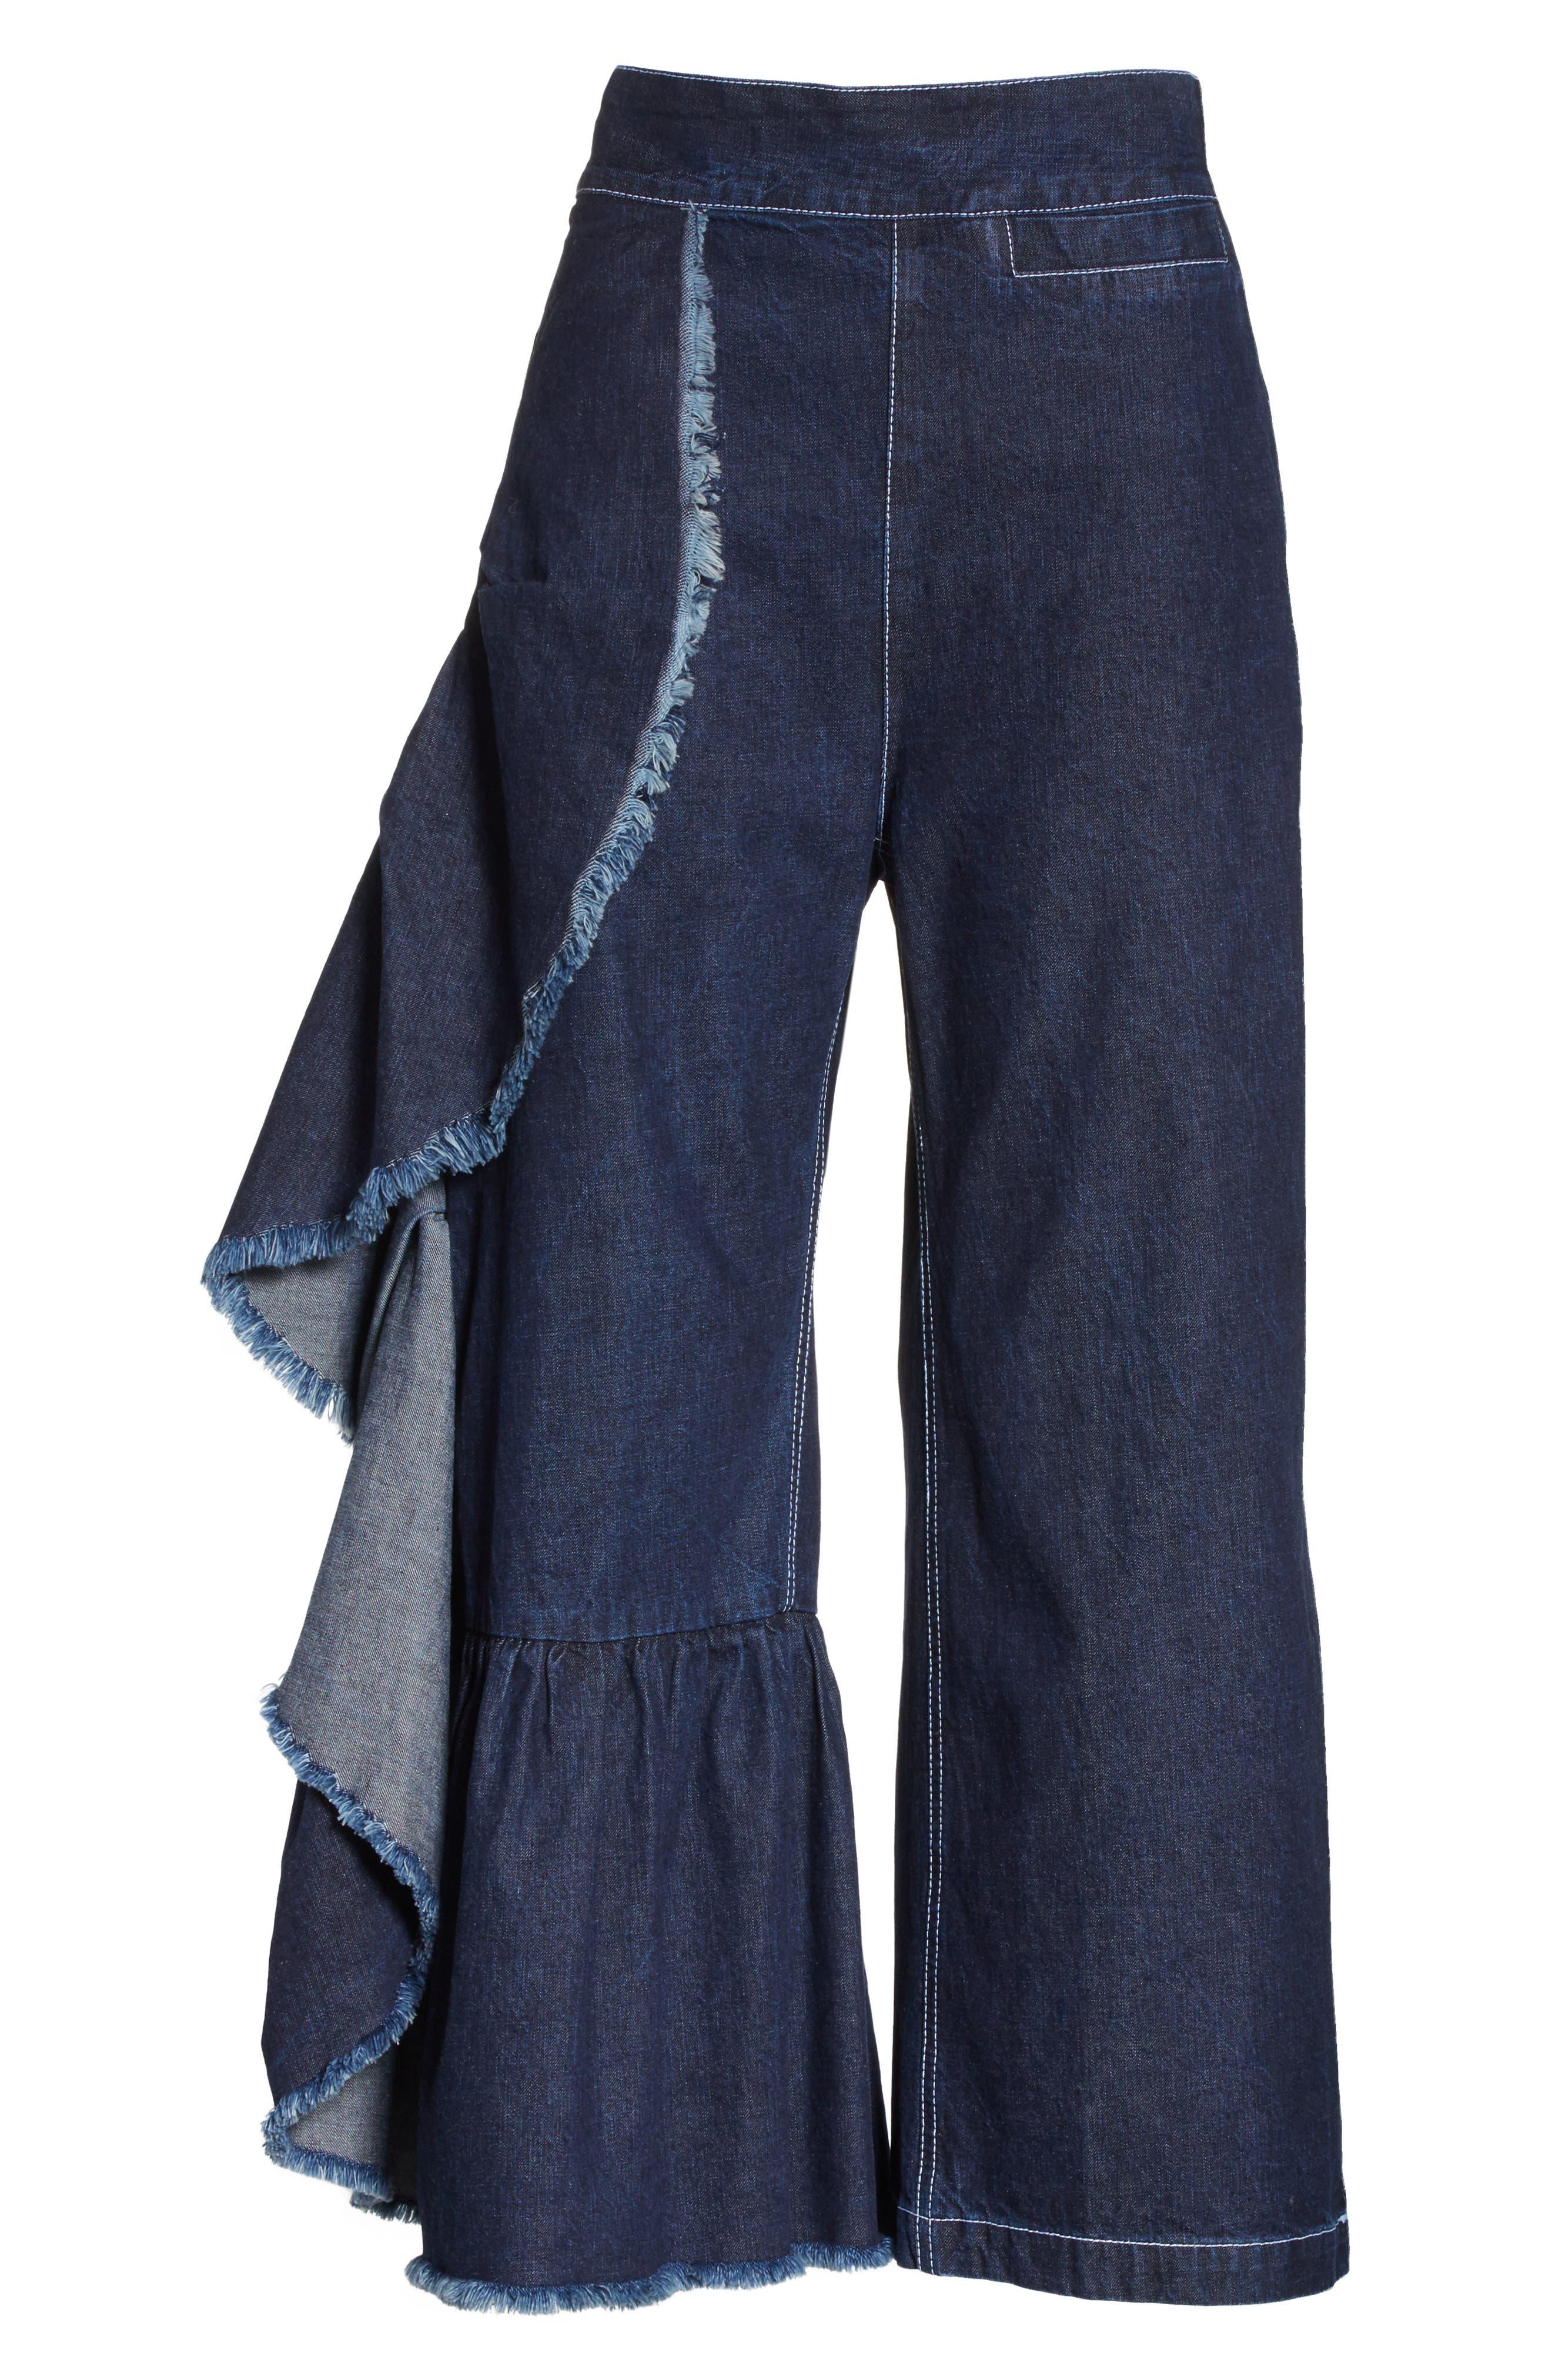 Revel Ruffle Pants,                             Alternate thumbnail 6, color,                             Dark Indigo